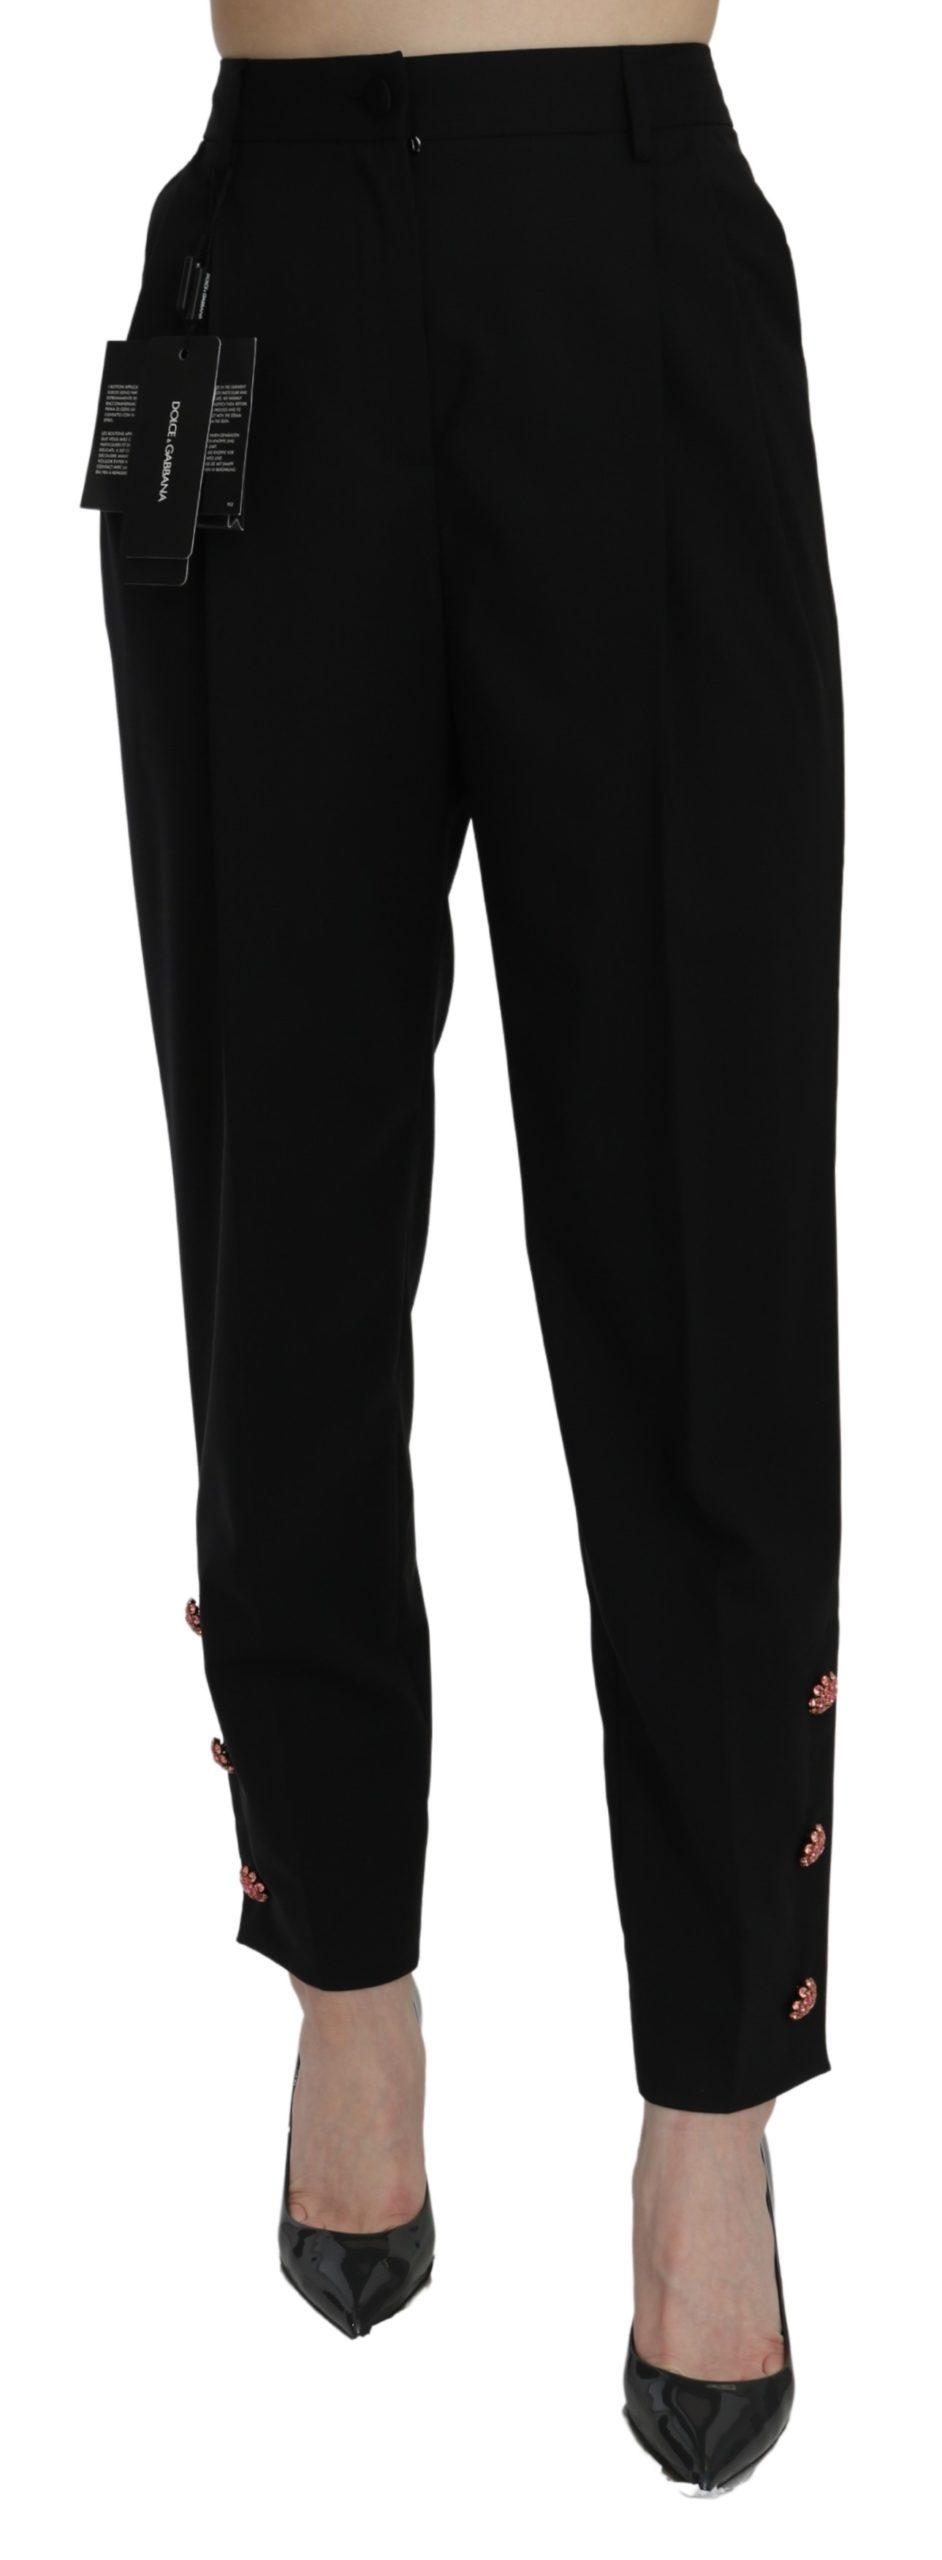 Dolce & Gabbana Women's Crystal High Waist Cotton Trouser Black PAN71015 - IT42|M